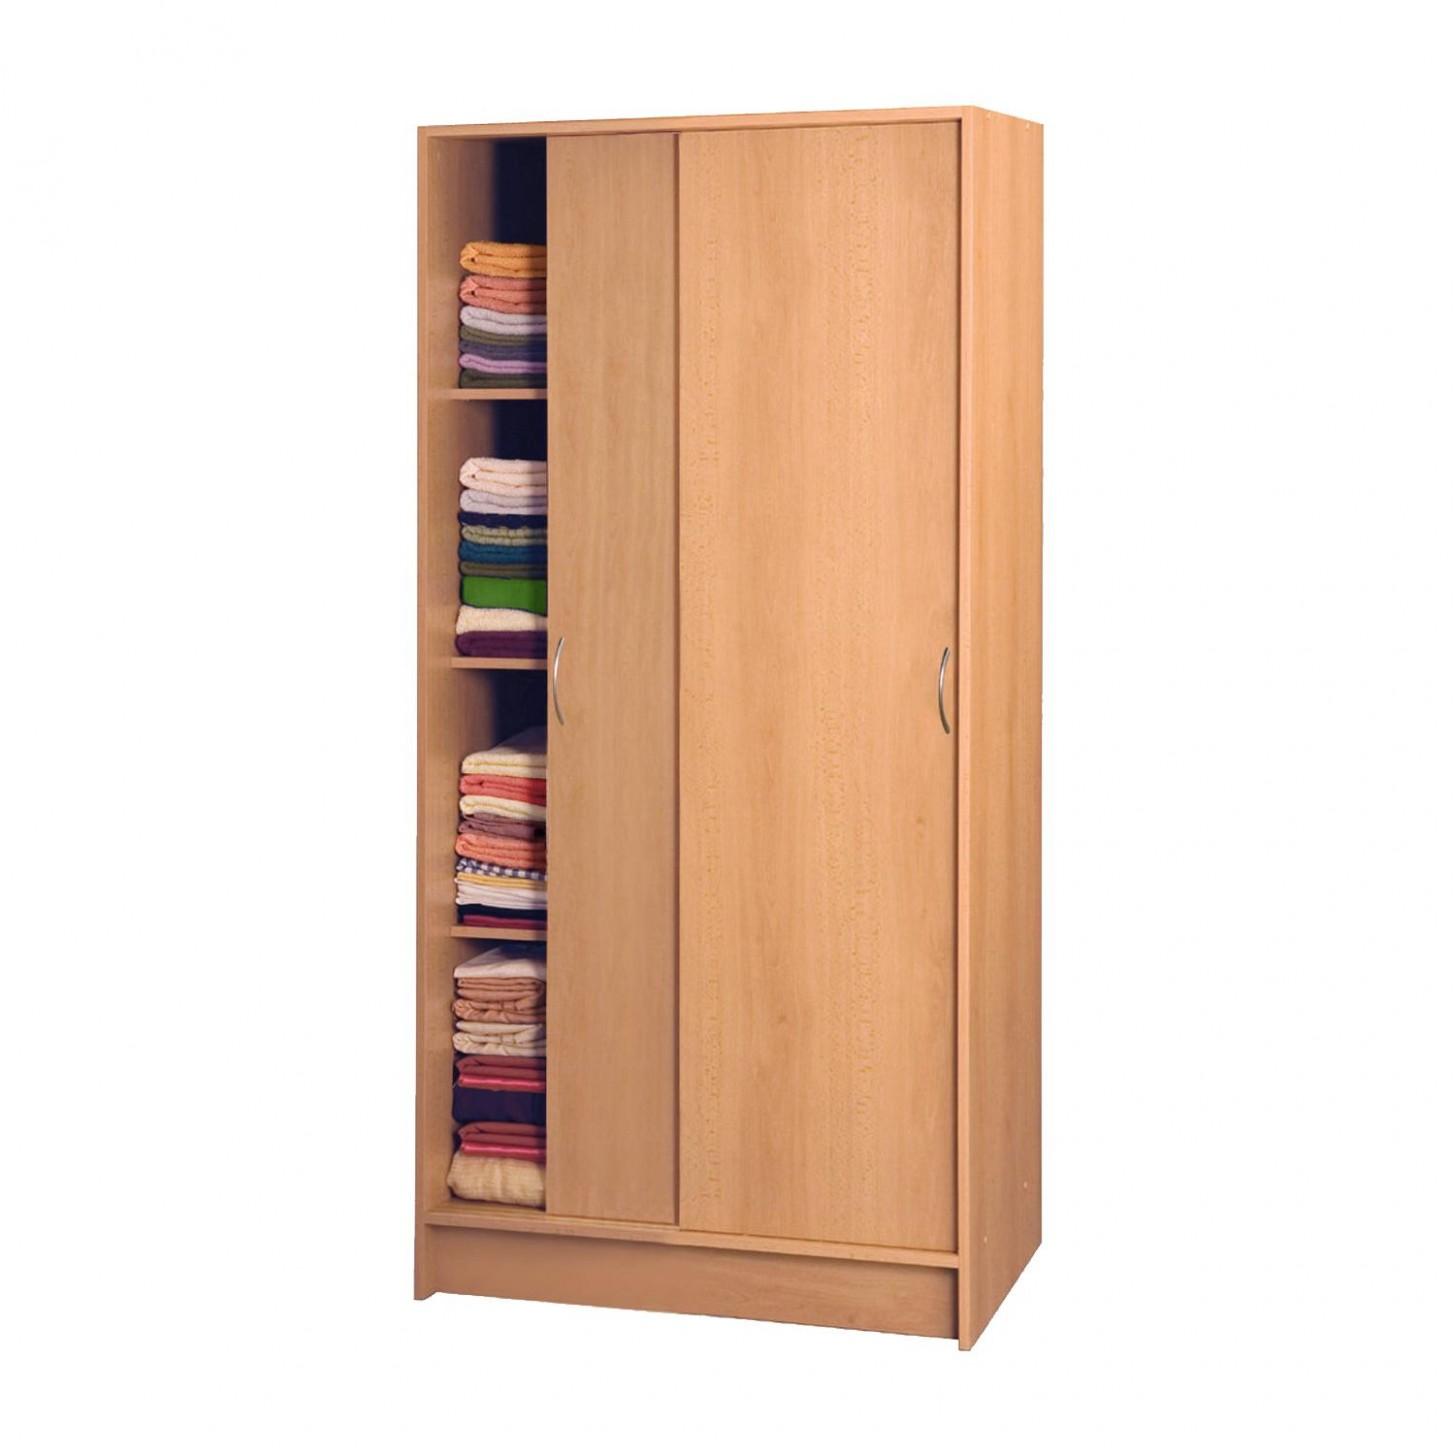 Skříň s posuvnými dveřmi 54 buk - Skříně - IDEA nábytek